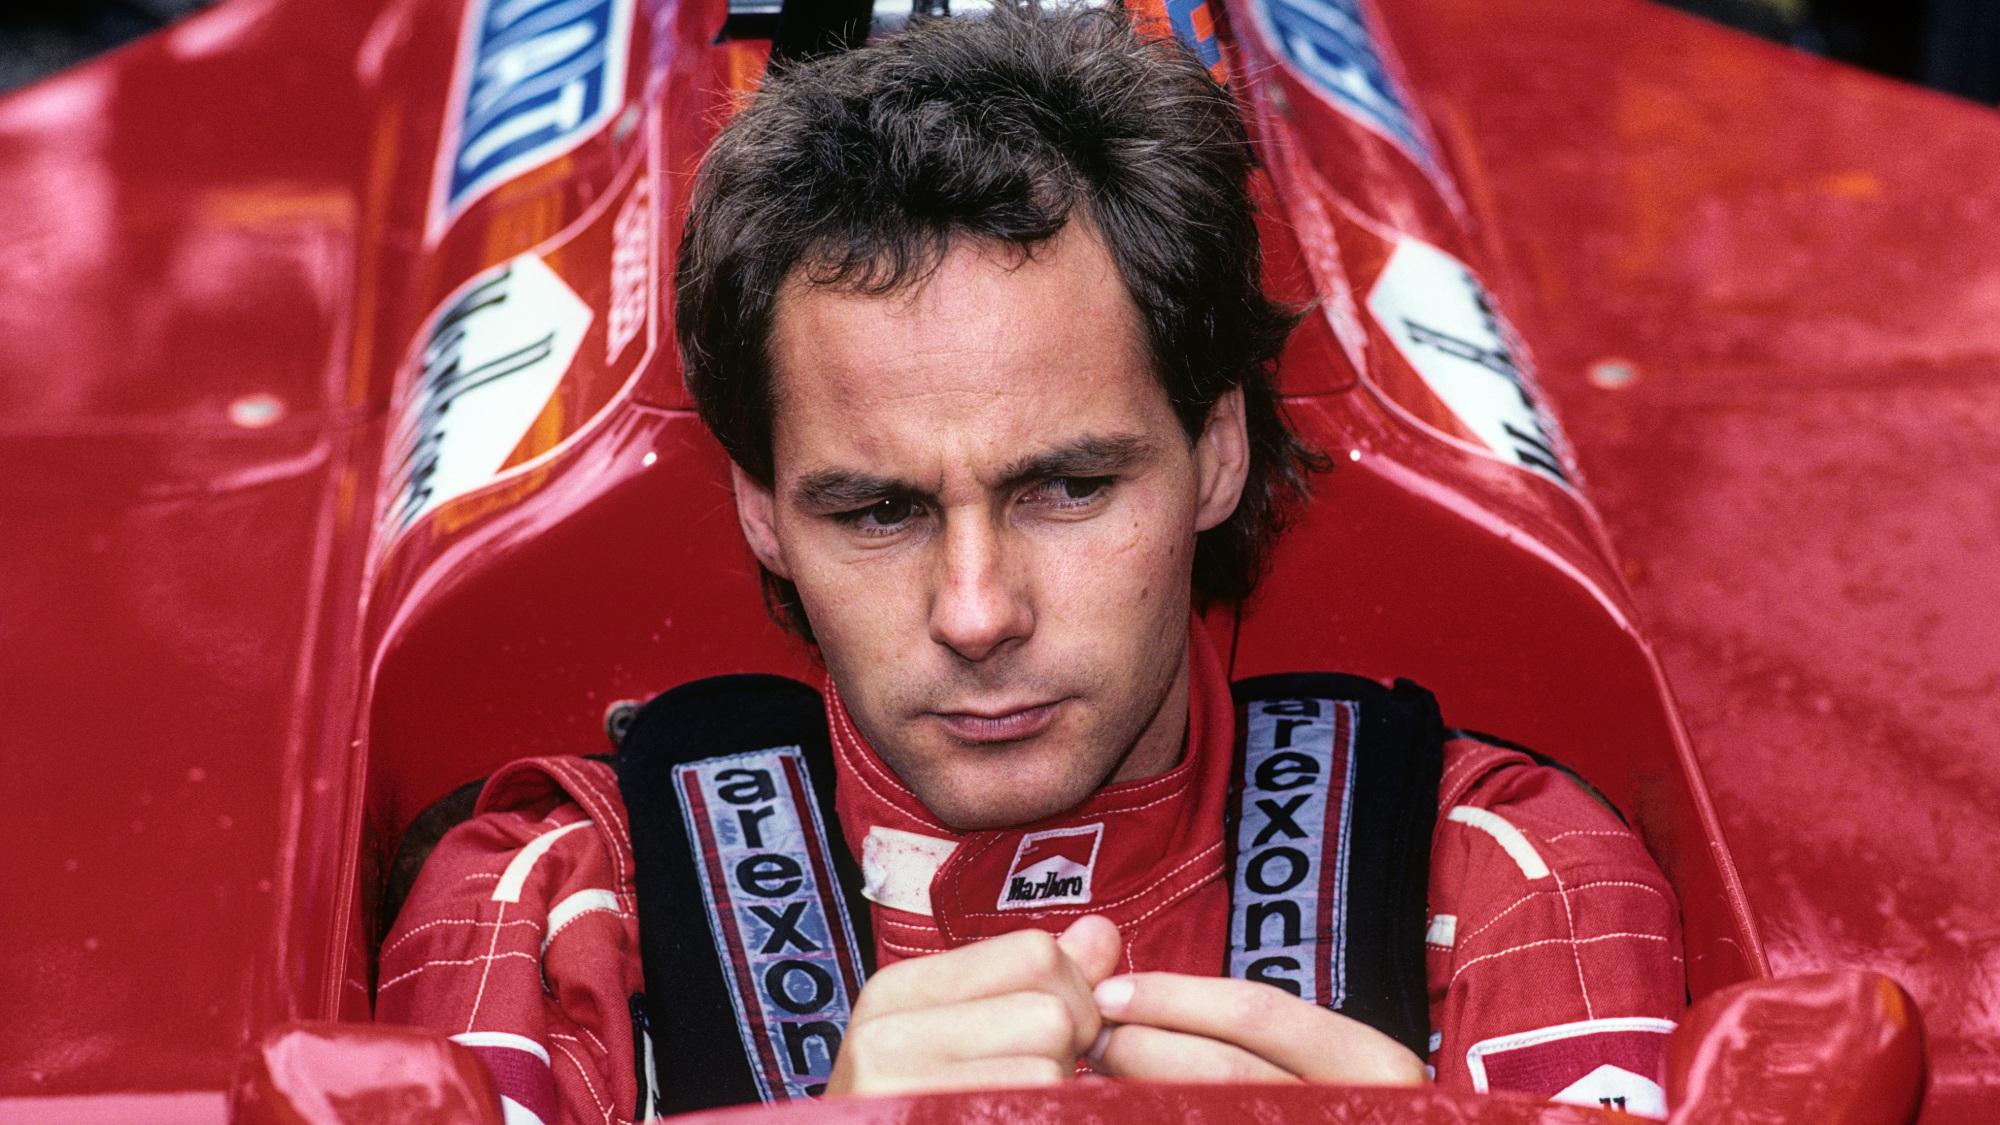 Gerhard Berger, 1988 Monaco GP